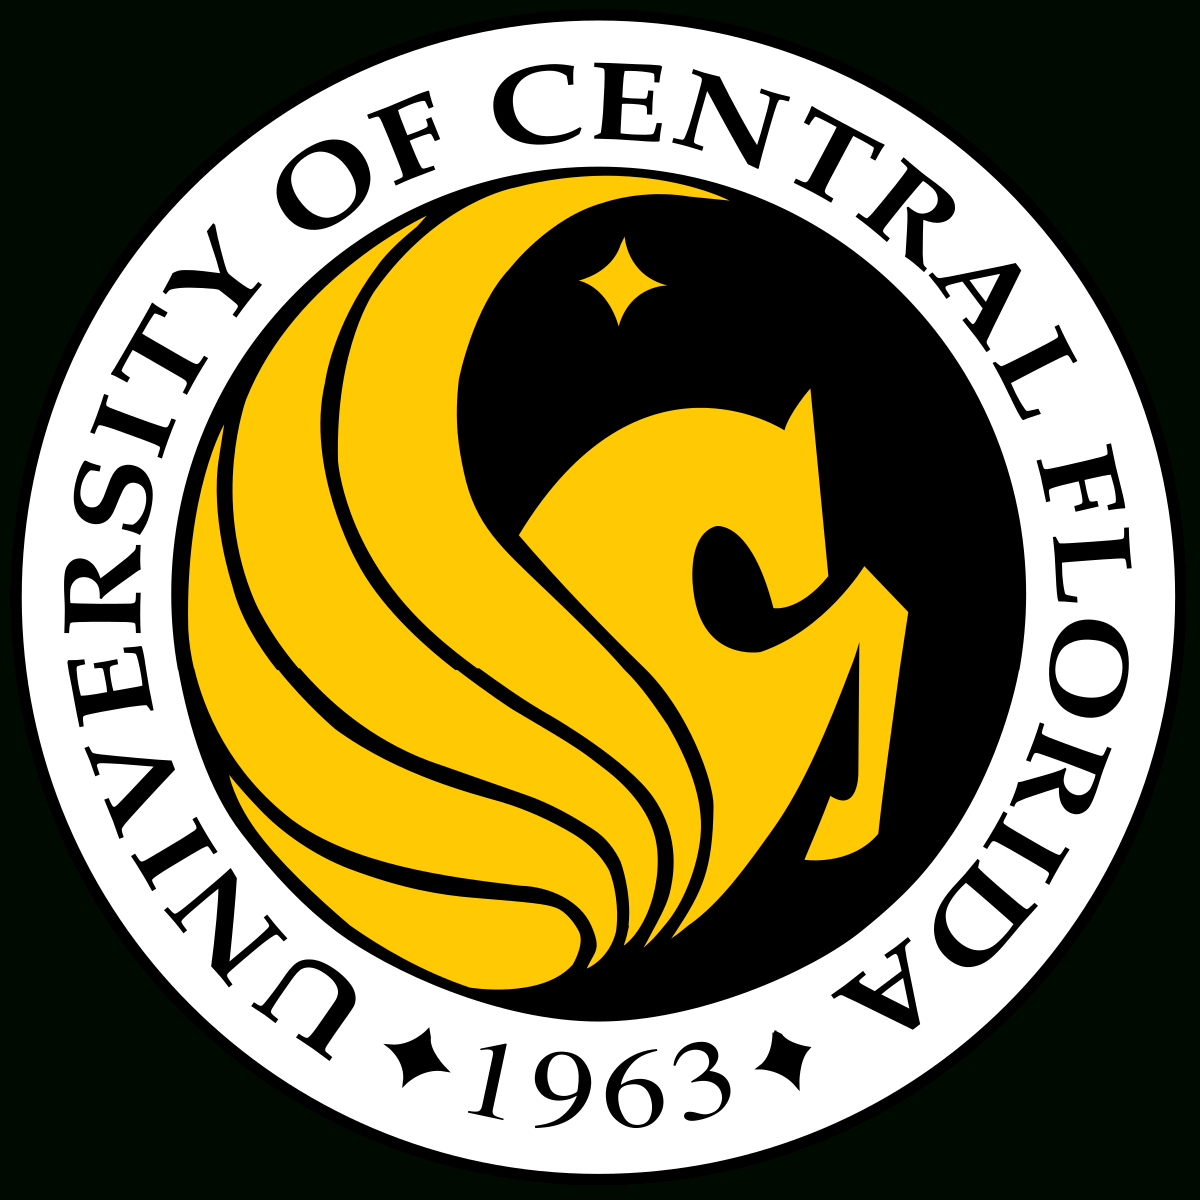 University Of Central Florida - Wikipedia